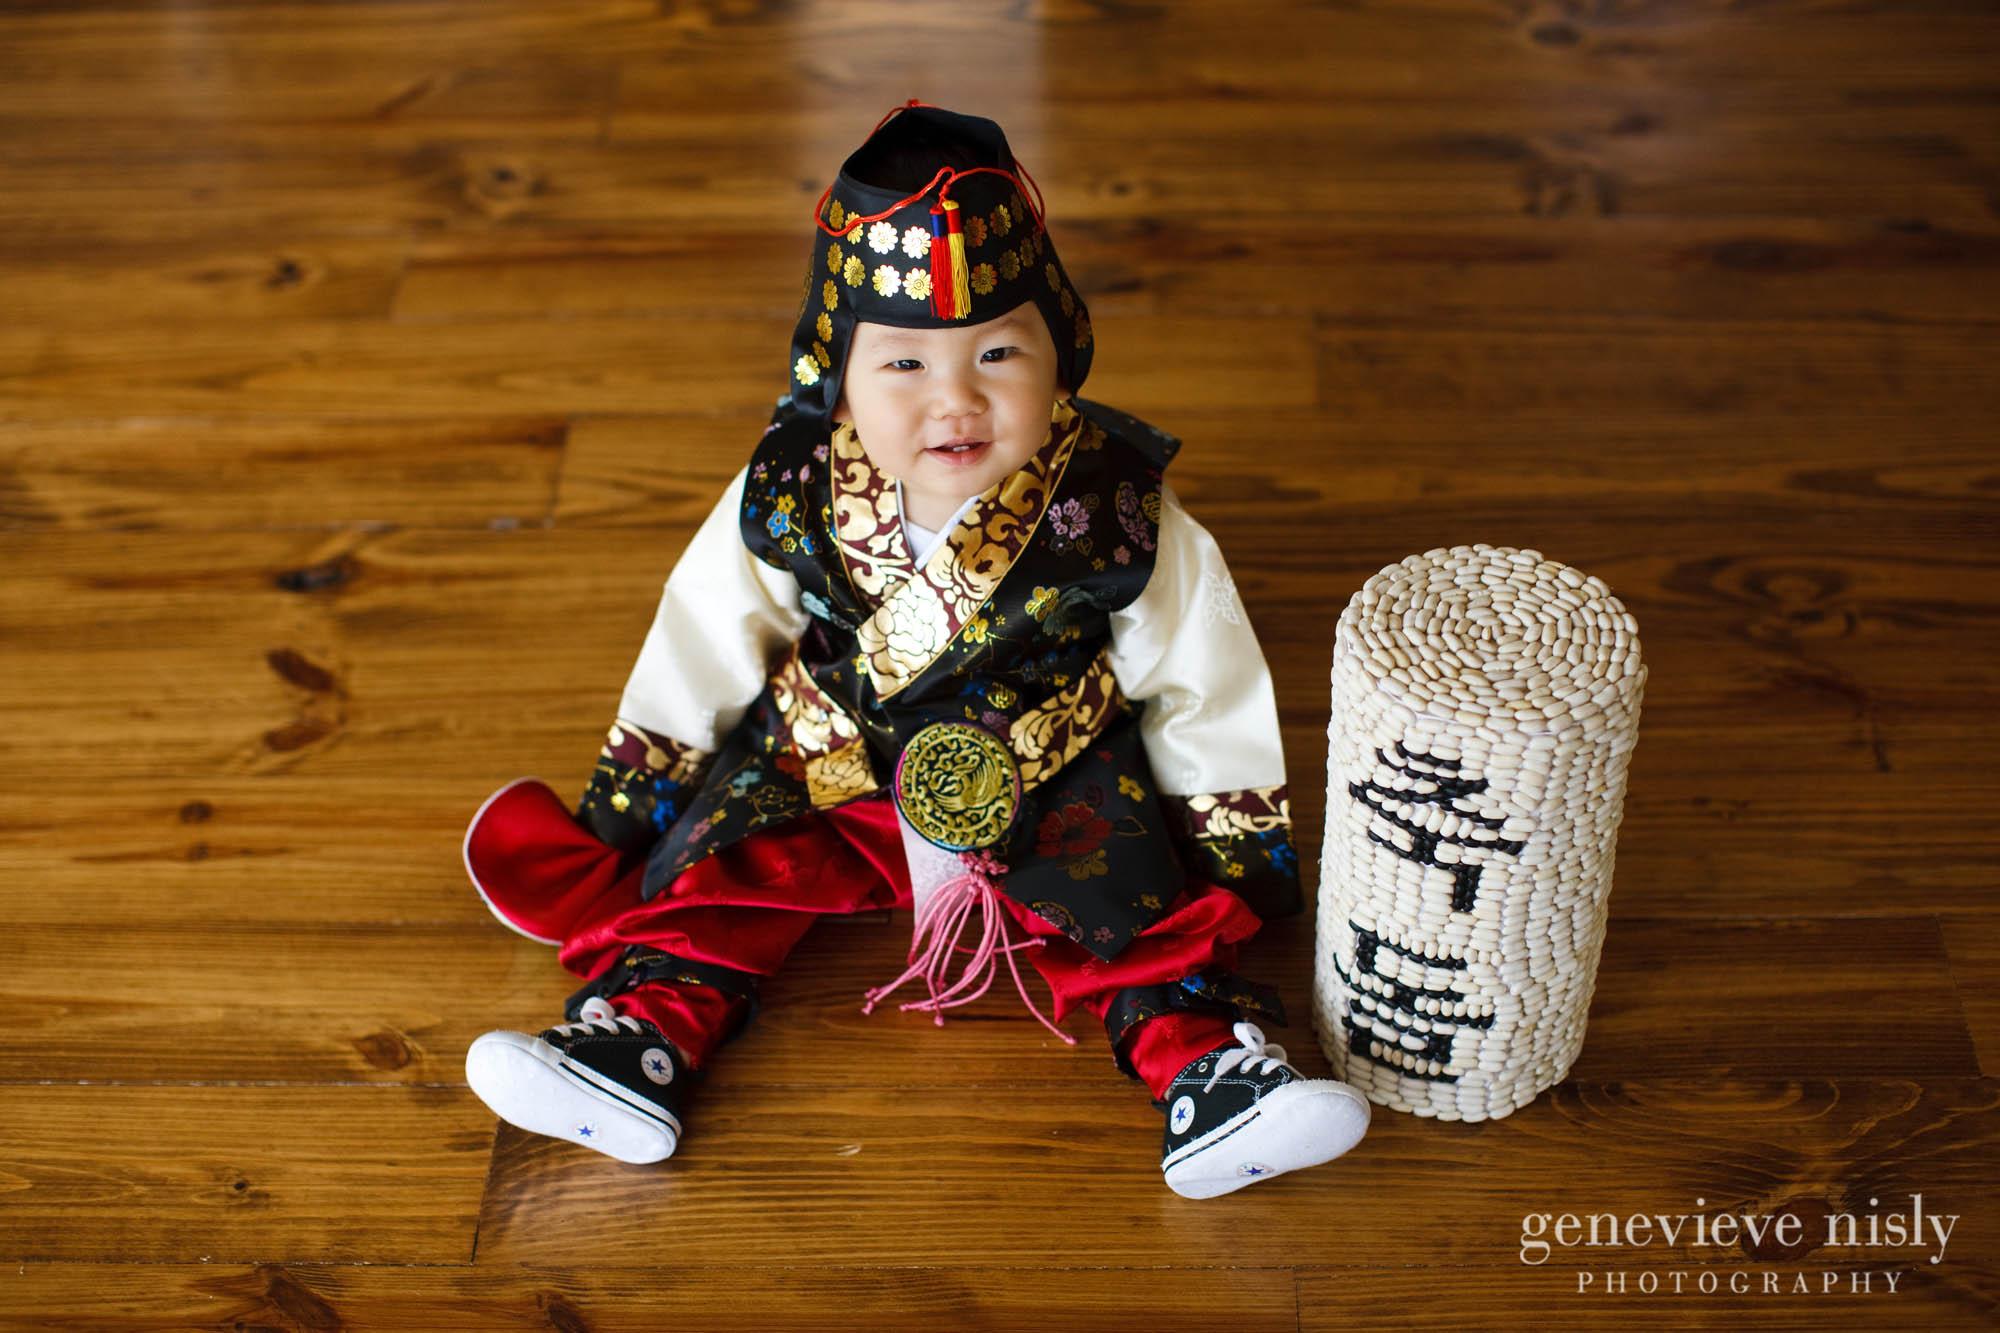 Cleveland, Copyright Genevieve Nisly Photography, Family, Kids, Ohio, Portraits